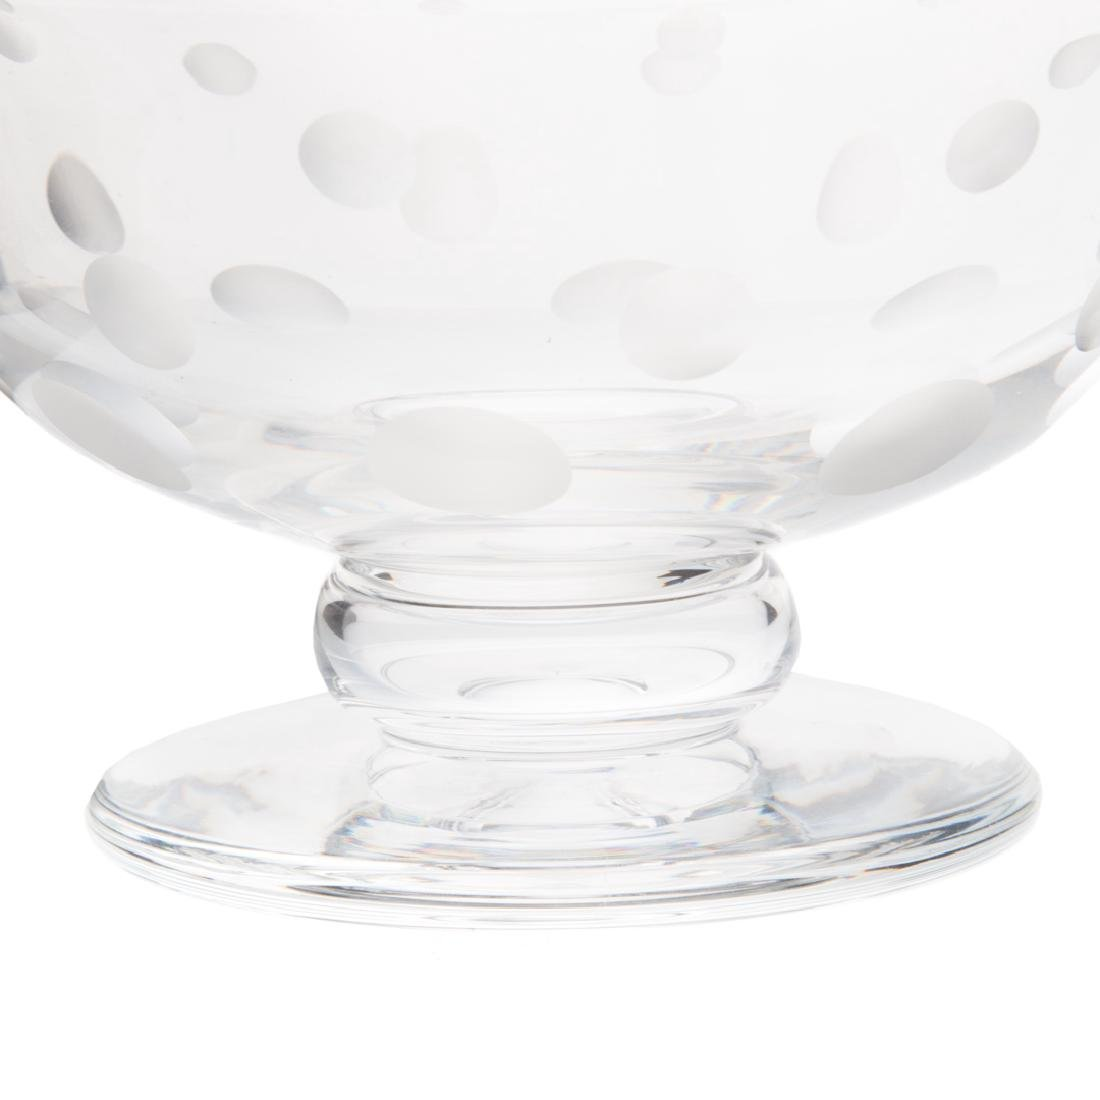 Steuben acid-etched glass compote - 2